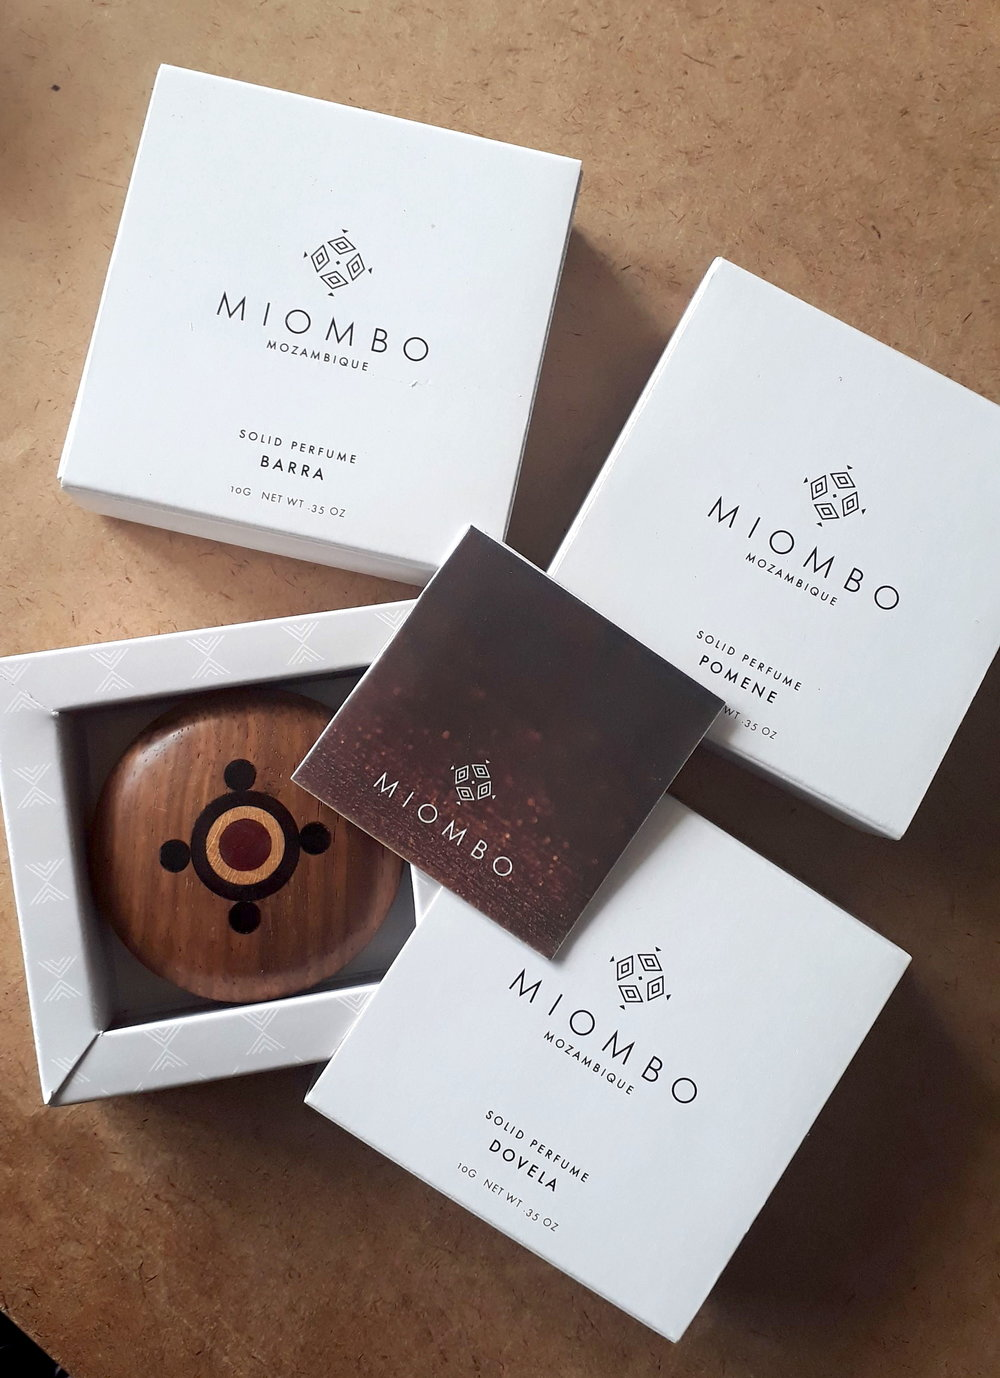 MIOMBO solidperfume1.jpg